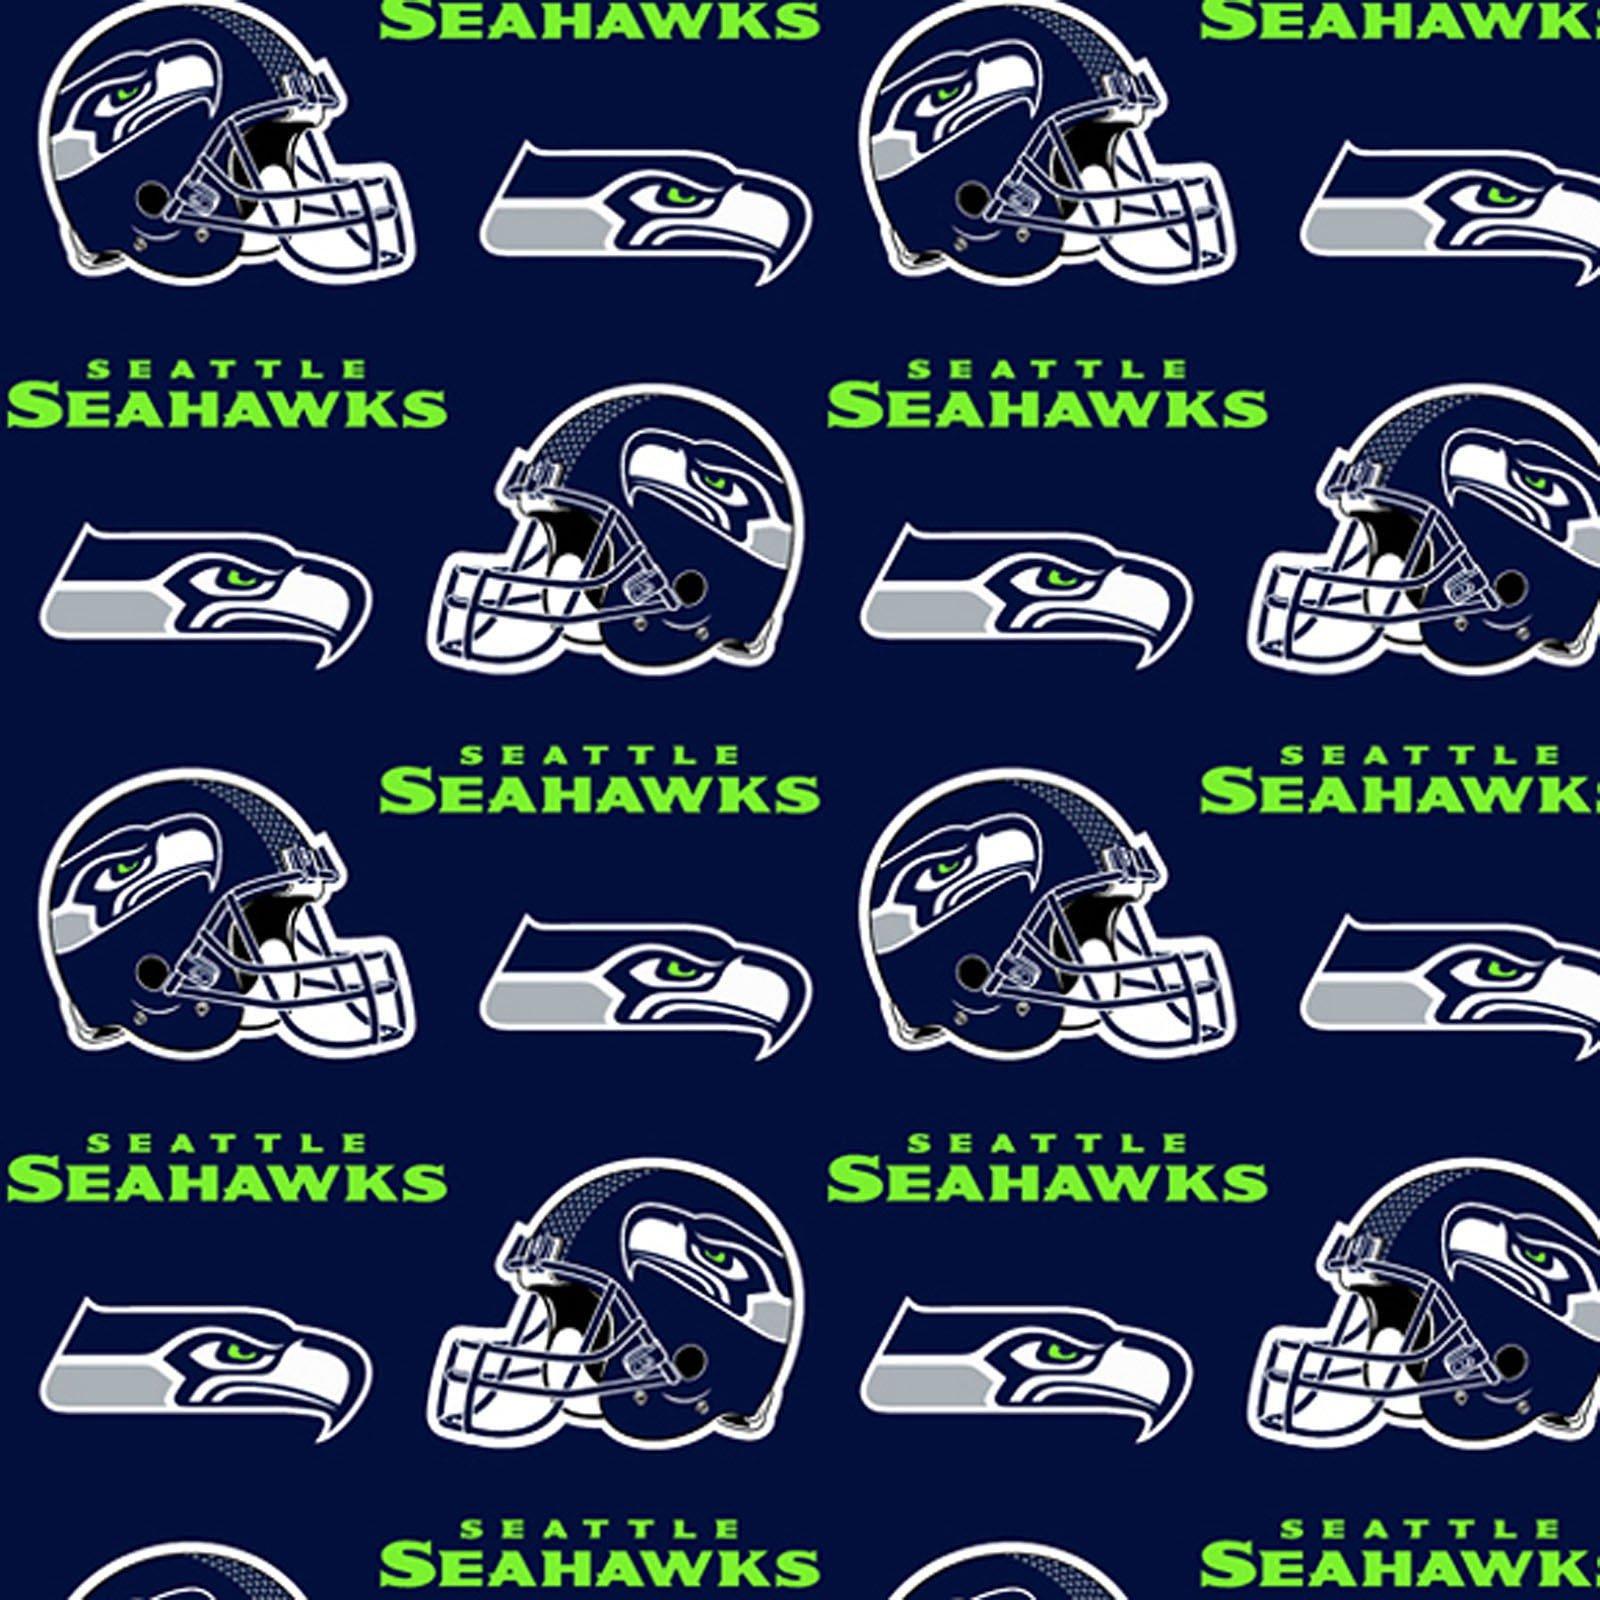 NFL prints